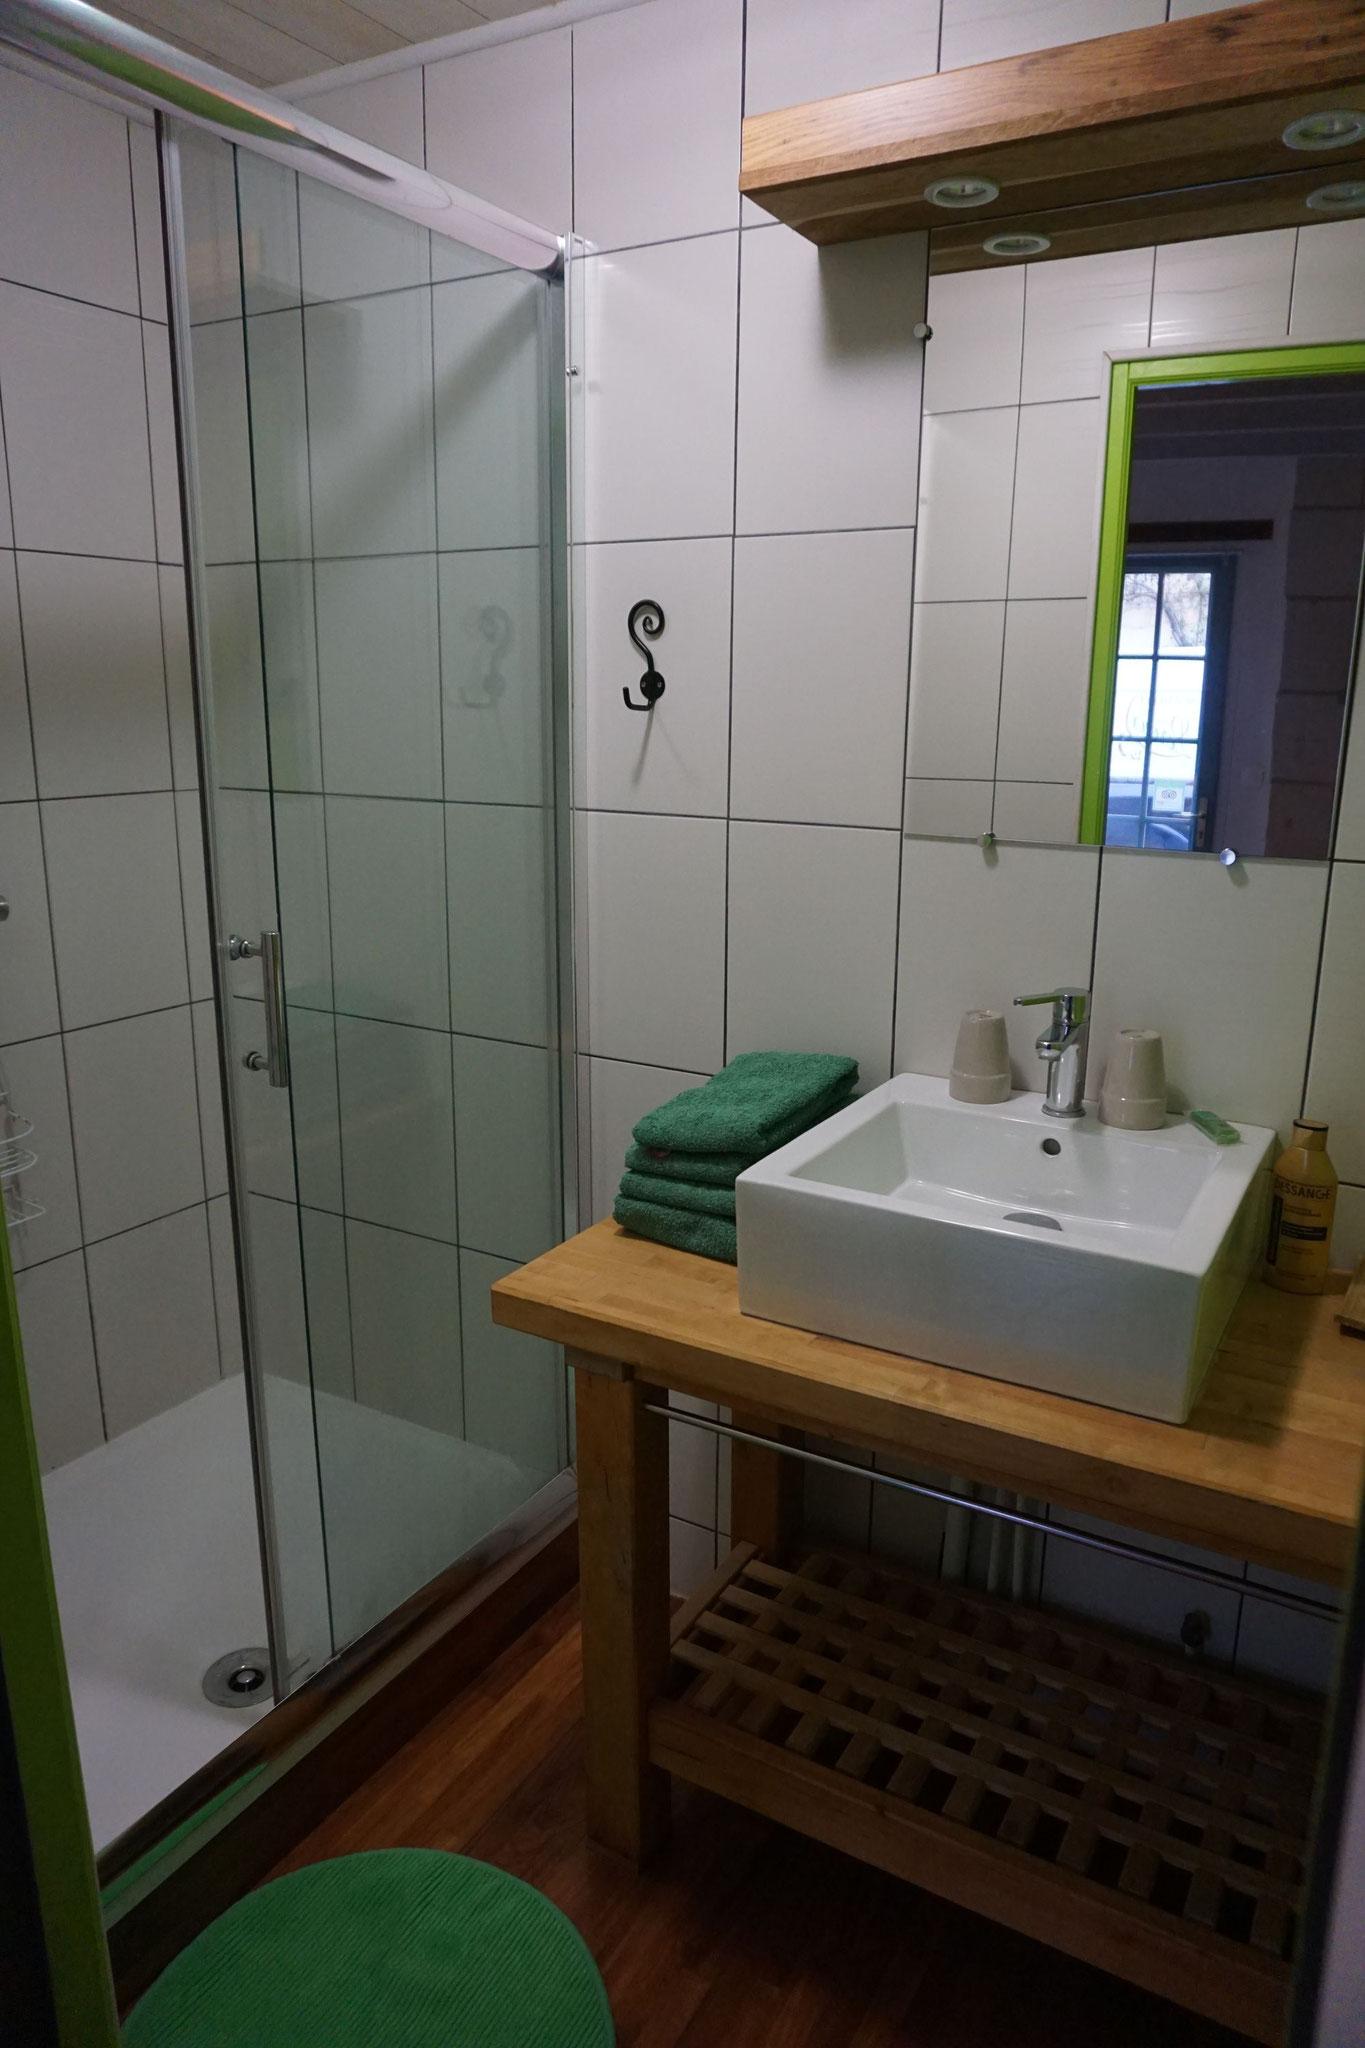 Salle de bain douche 90 x 120 cm